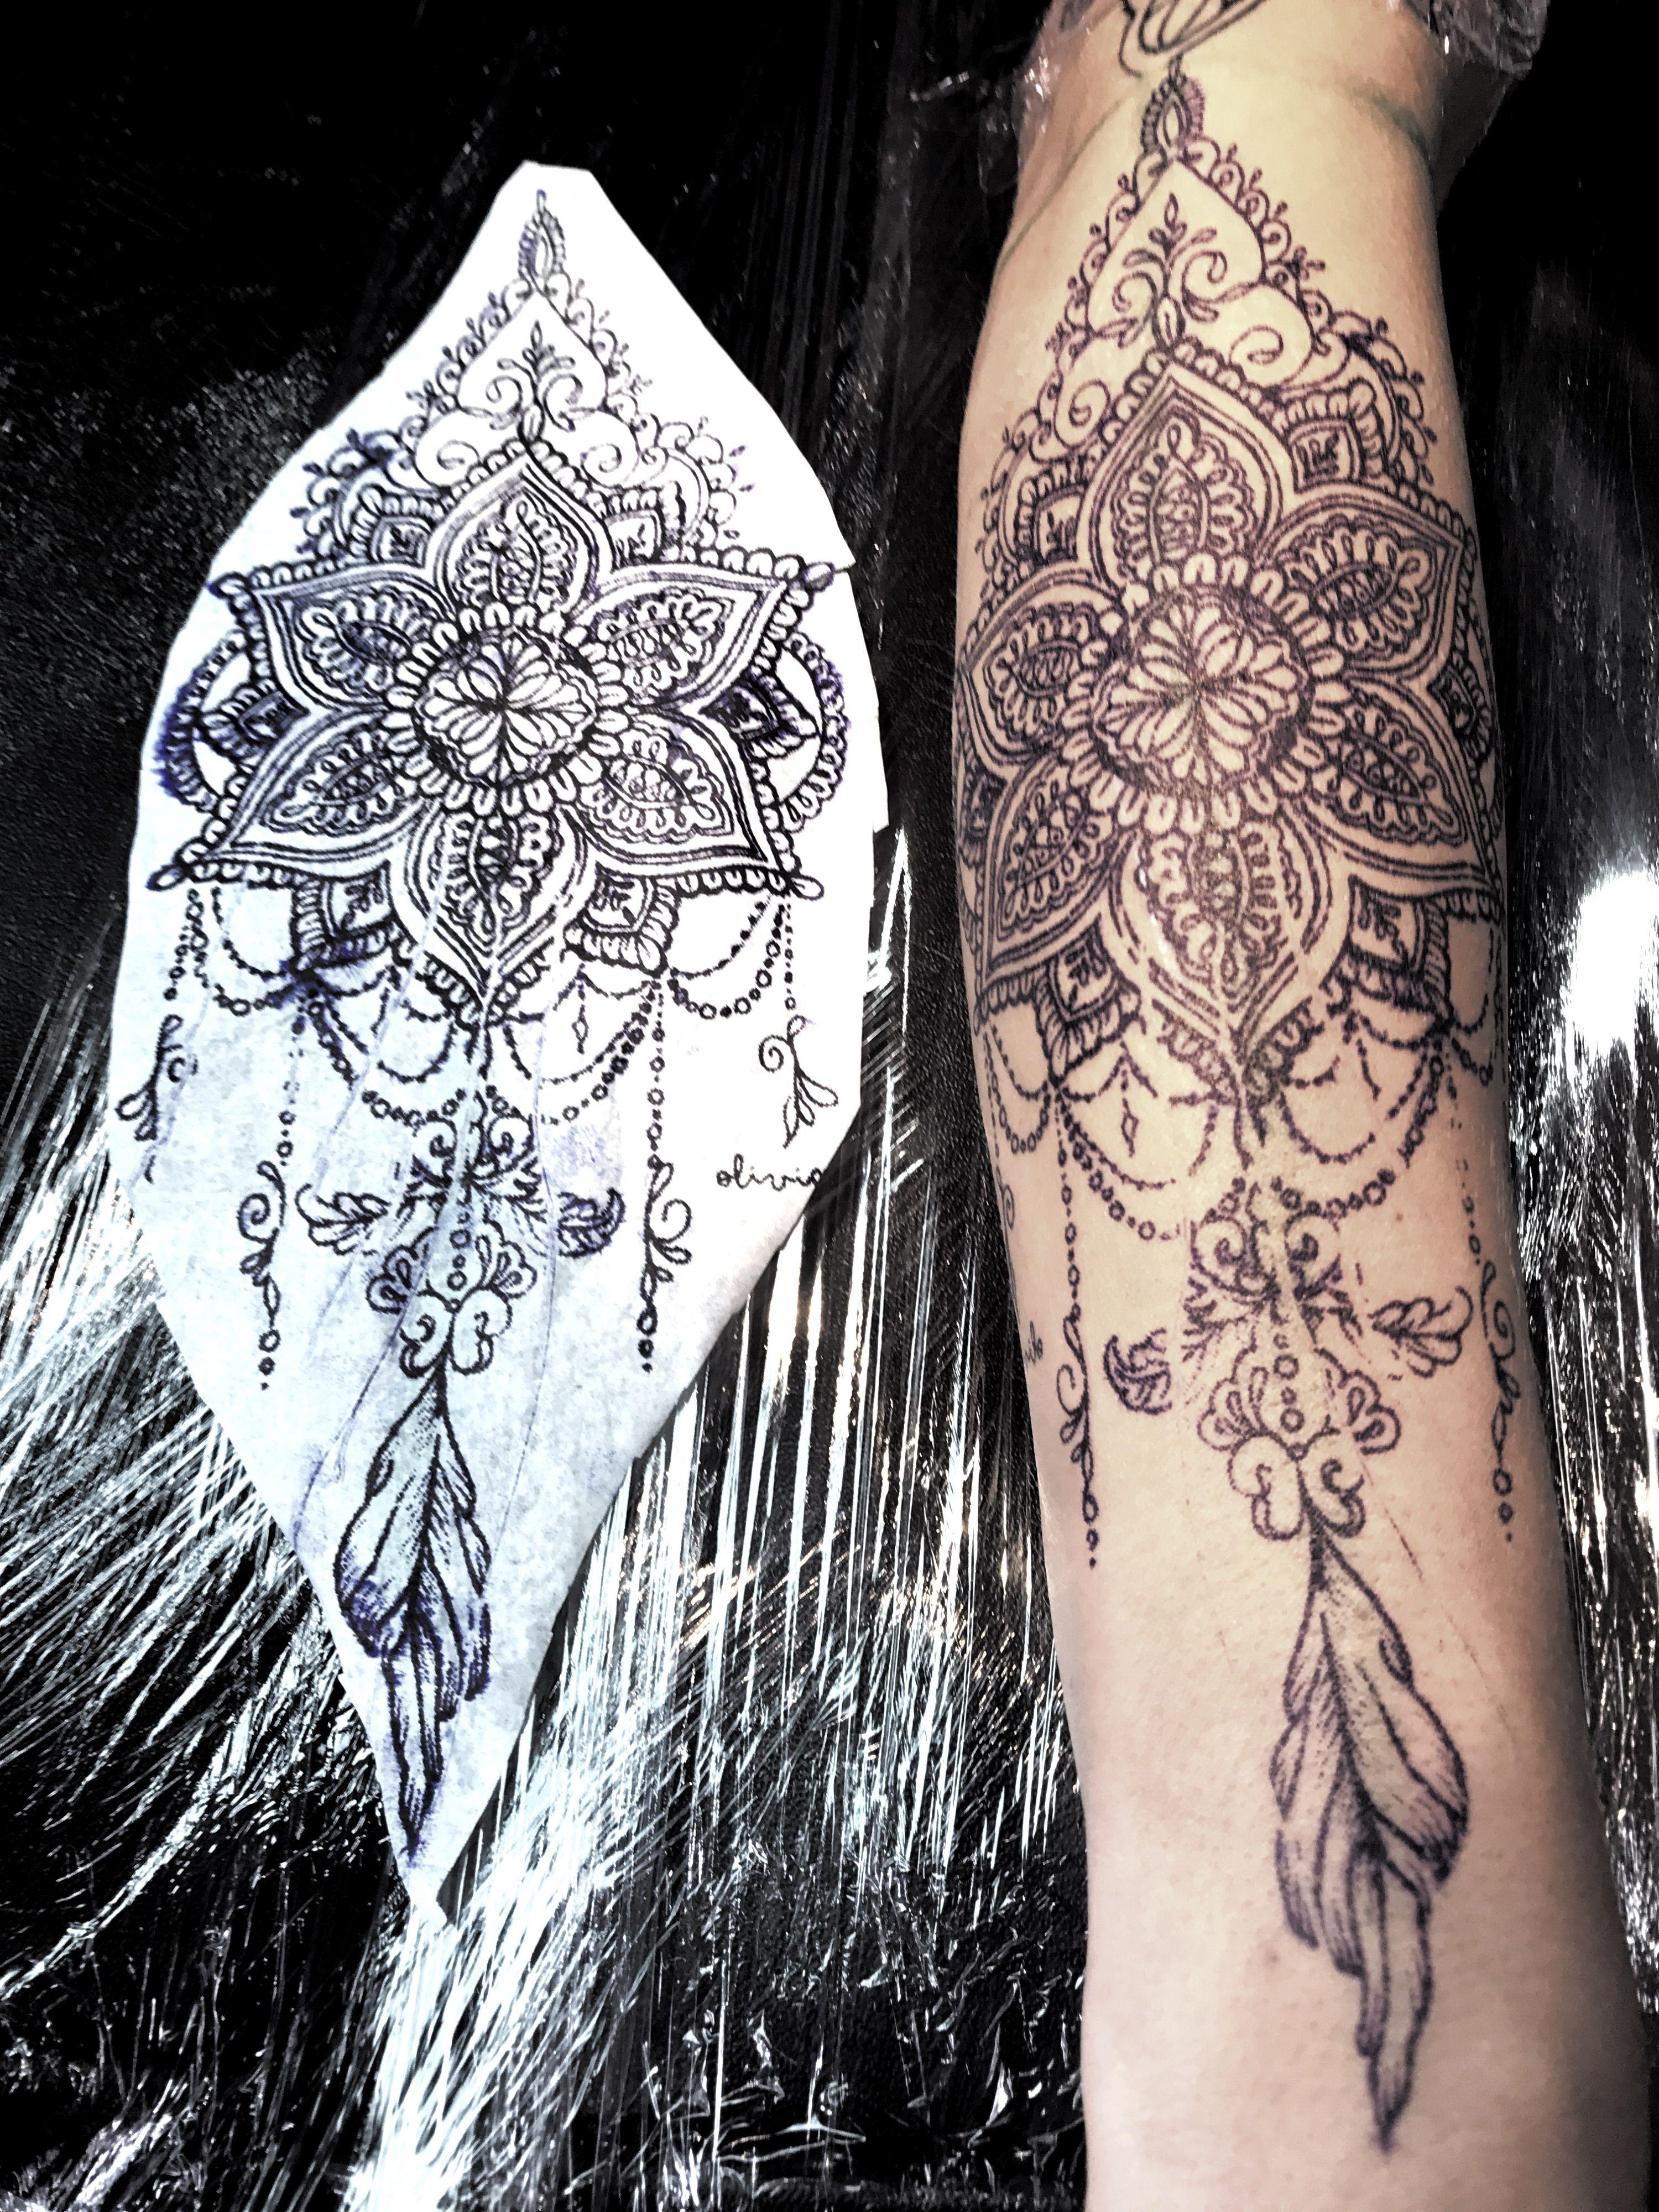 Mandala Design For Girl Tattoo Mandala Tattoos For Women Tattoos Leg Tattoos